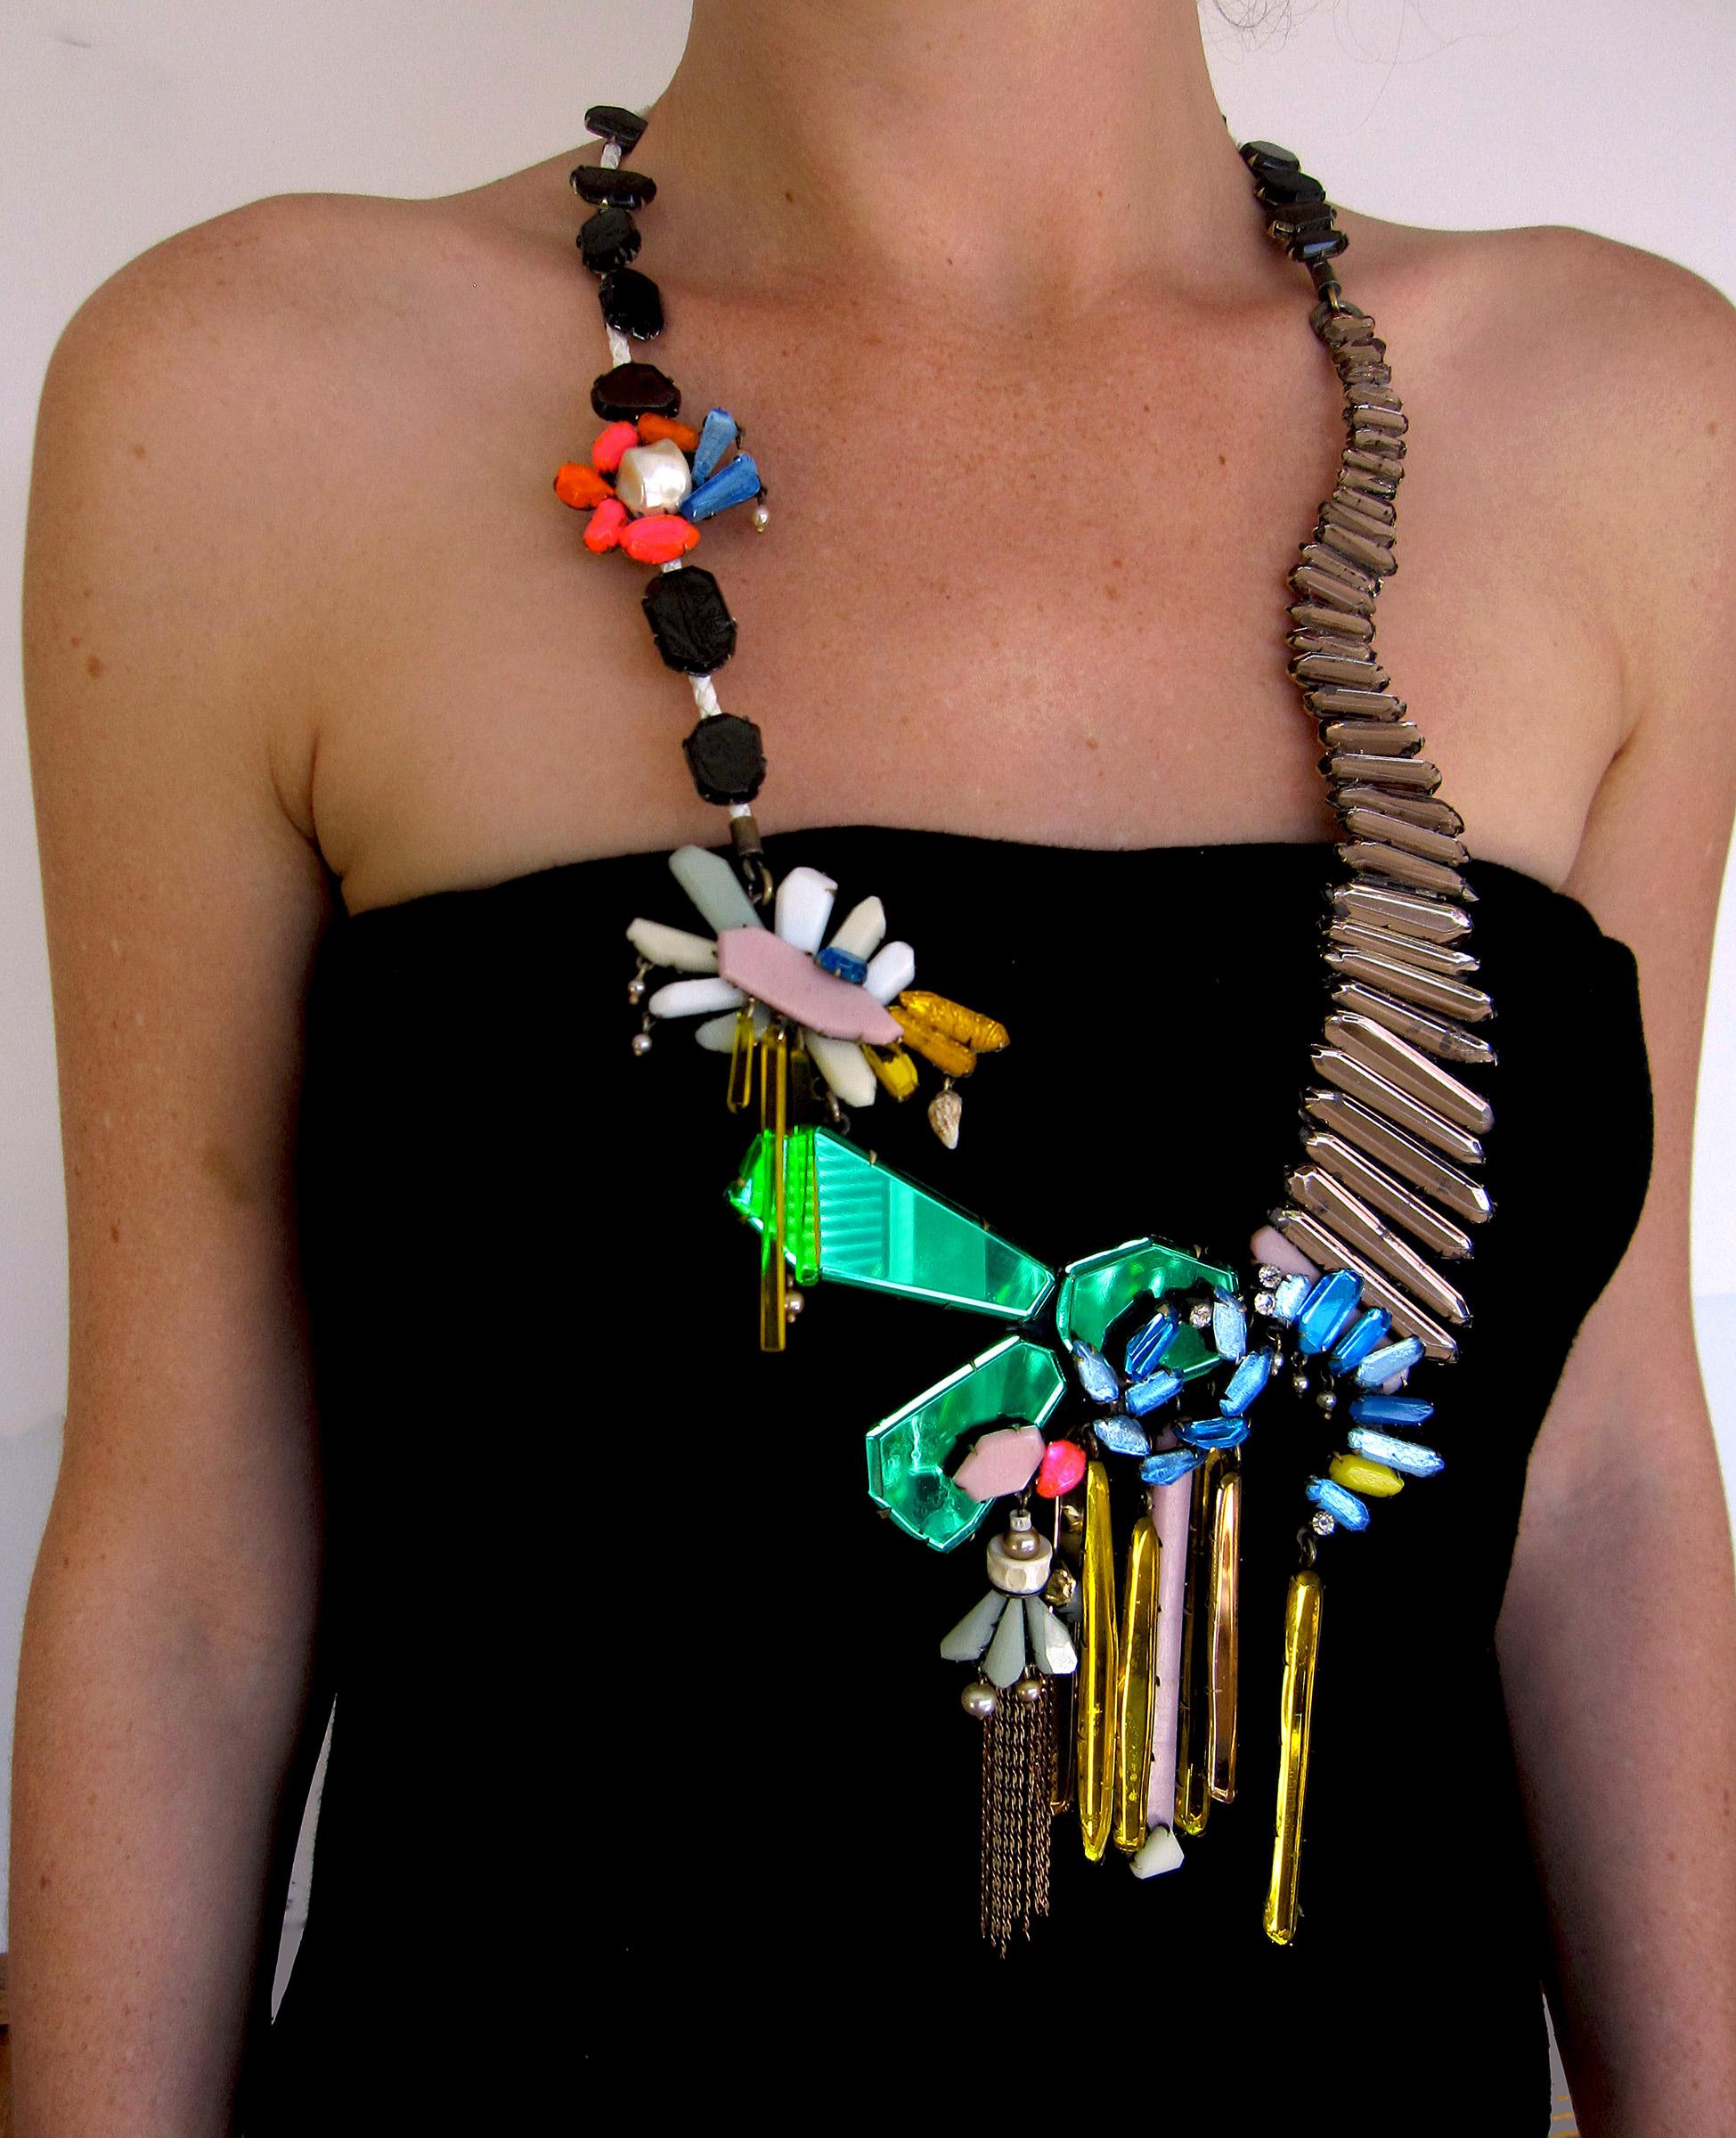 Nikki Couppee, Cascades, halssieraad, 2012, plexiglas, messing, leer, schelp, acryl